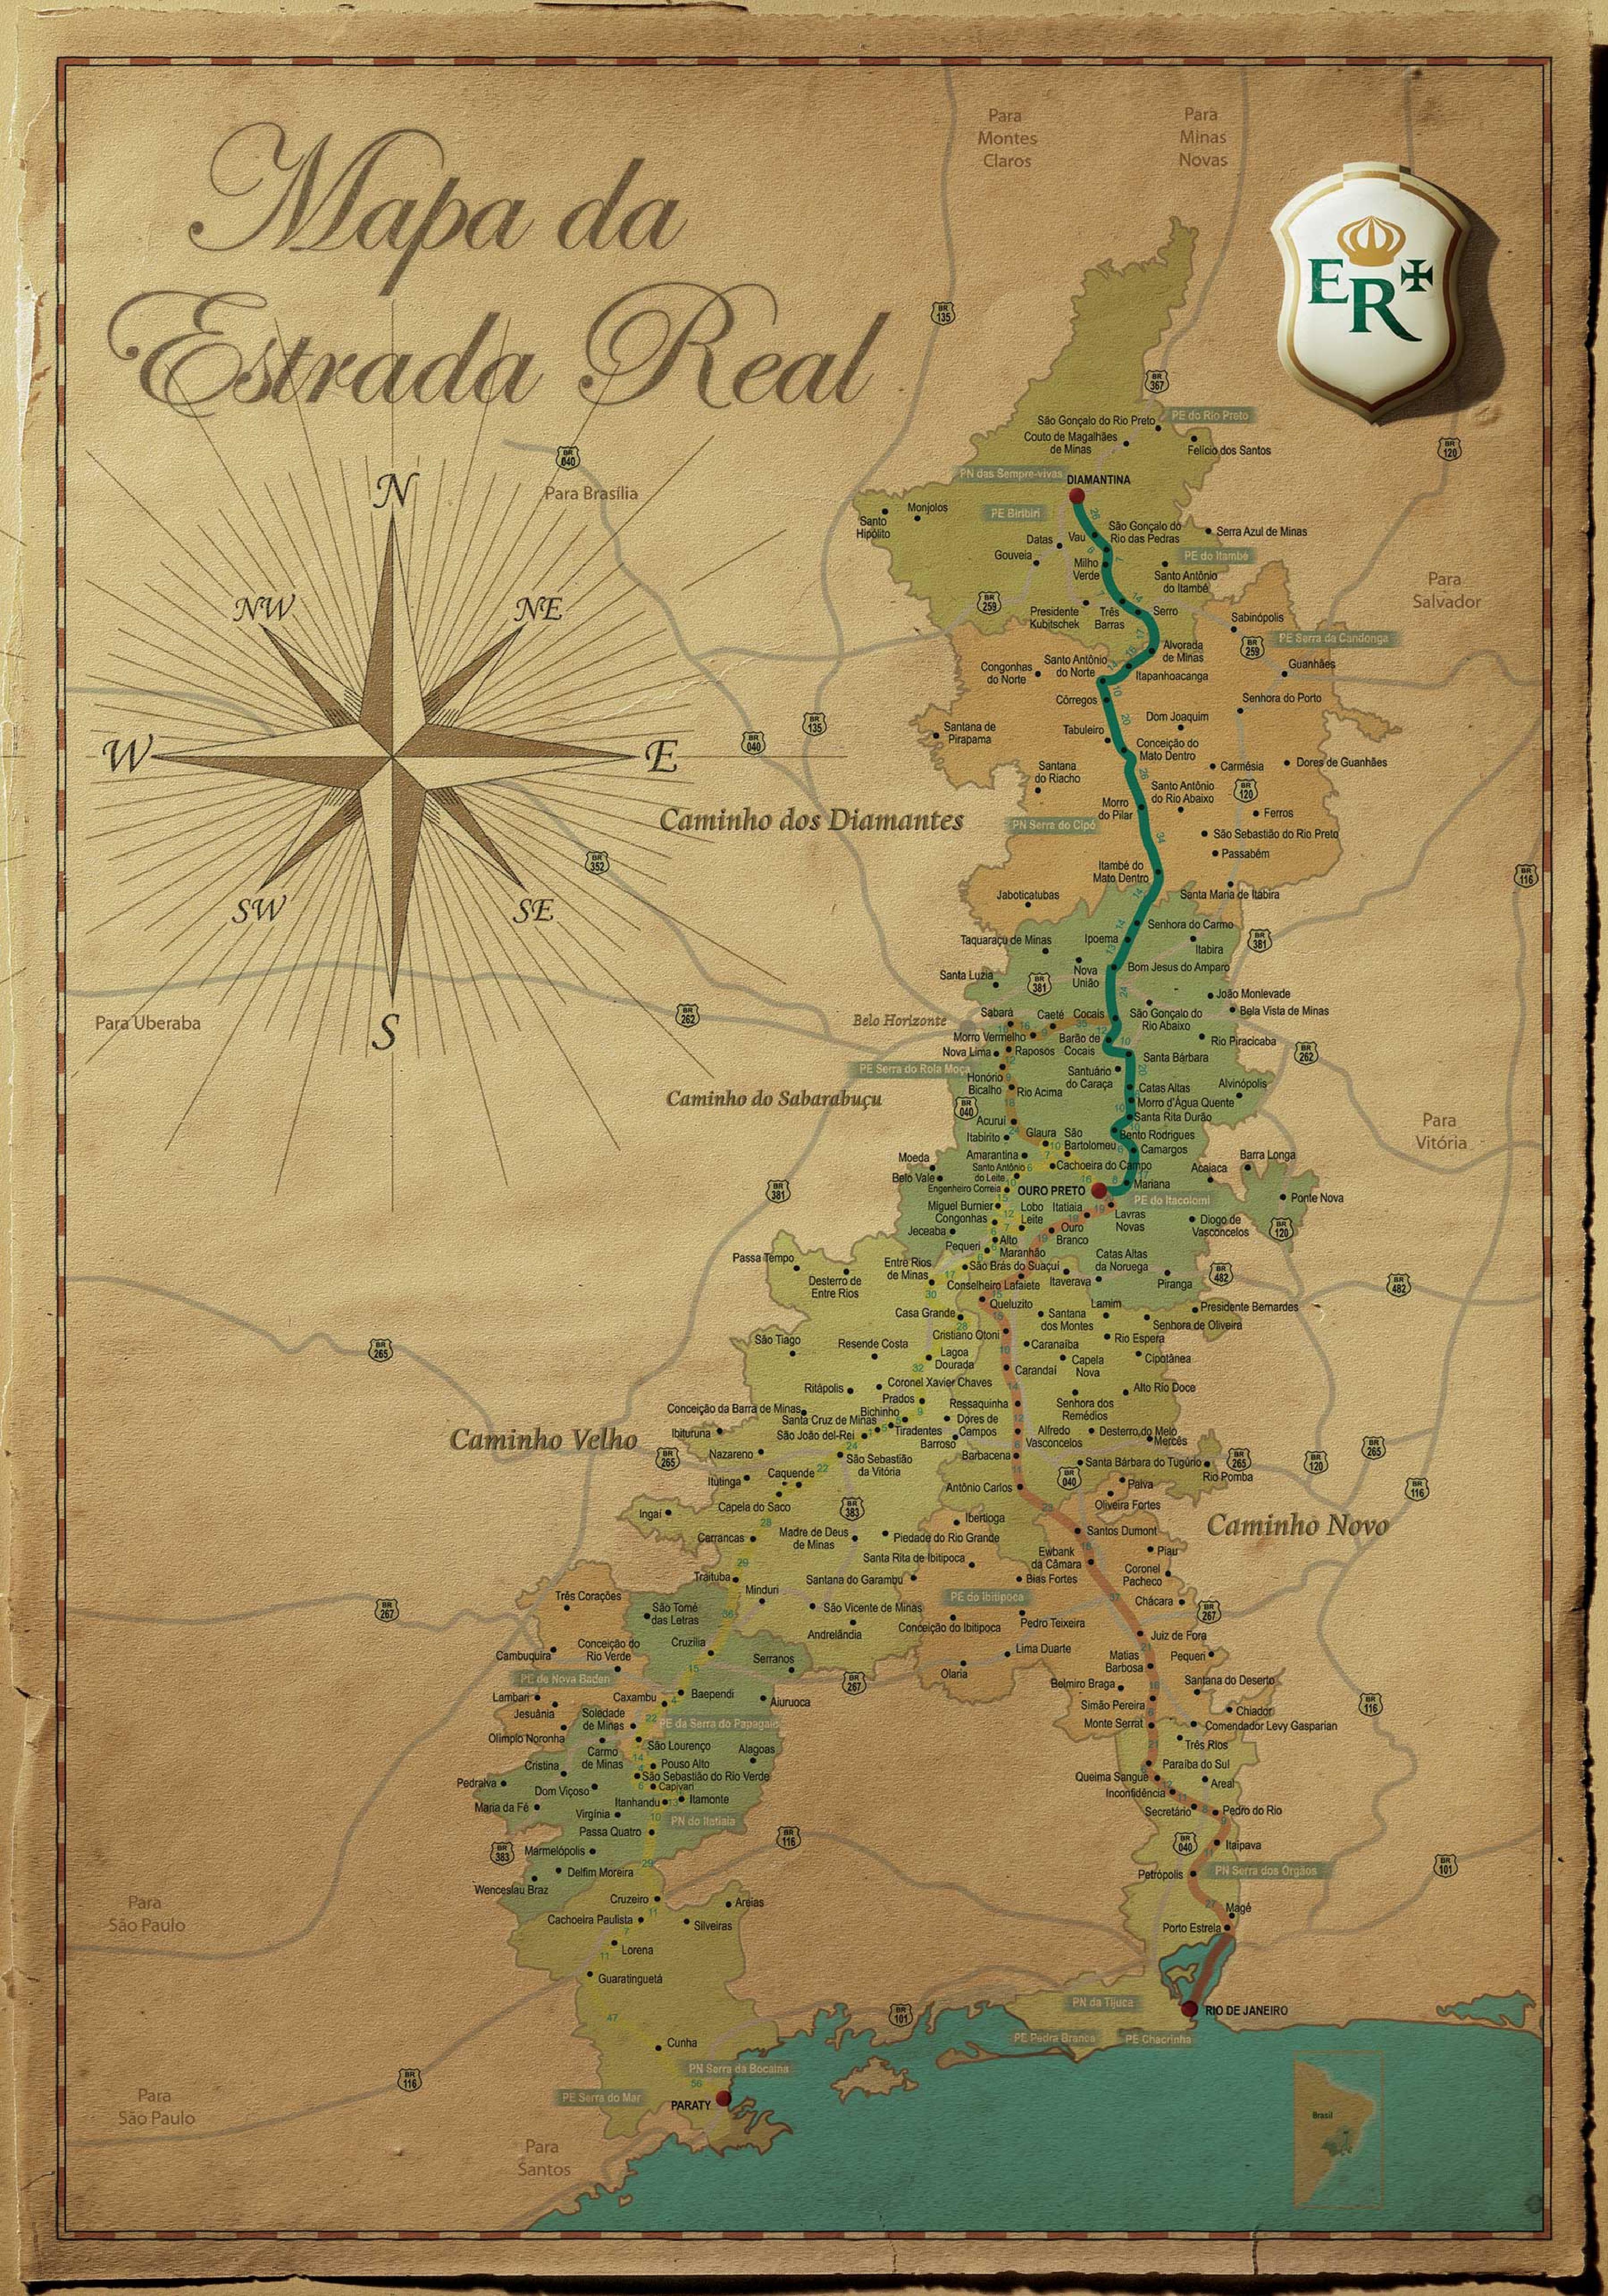 mapa da estrada File:Mapa da Estrada Real.pdf   Wikimedia Commons mapa da estrada